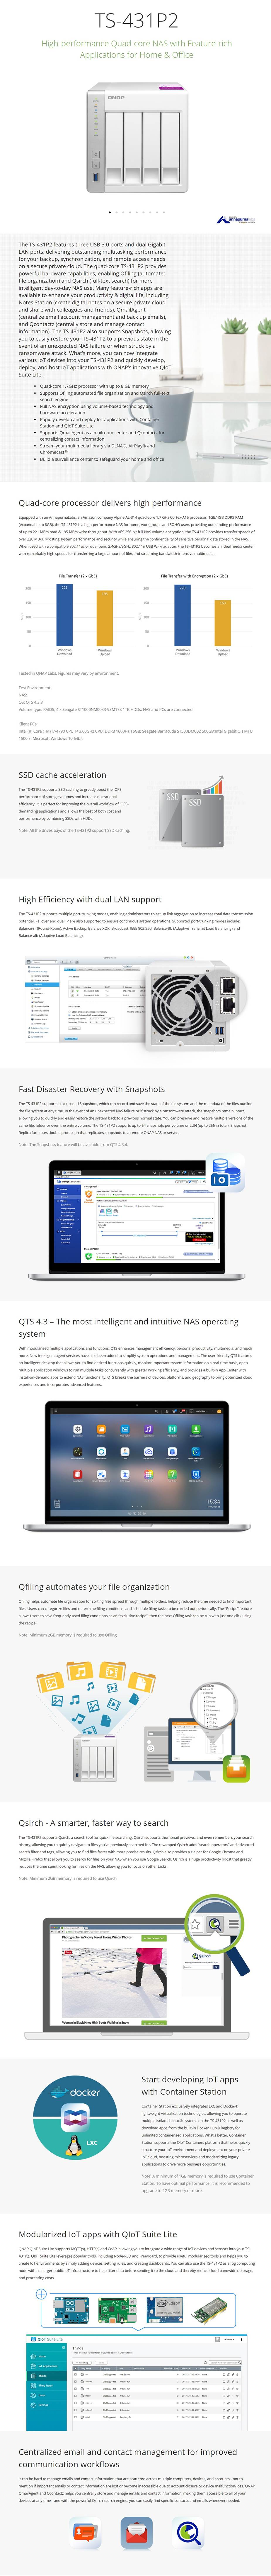 QNAP TS-431P2-4G 4 Bay Diskless NAS Alpine AL-314 Quad Core 1.7GHz CPU 4GB RAM - Desktop Overview 1